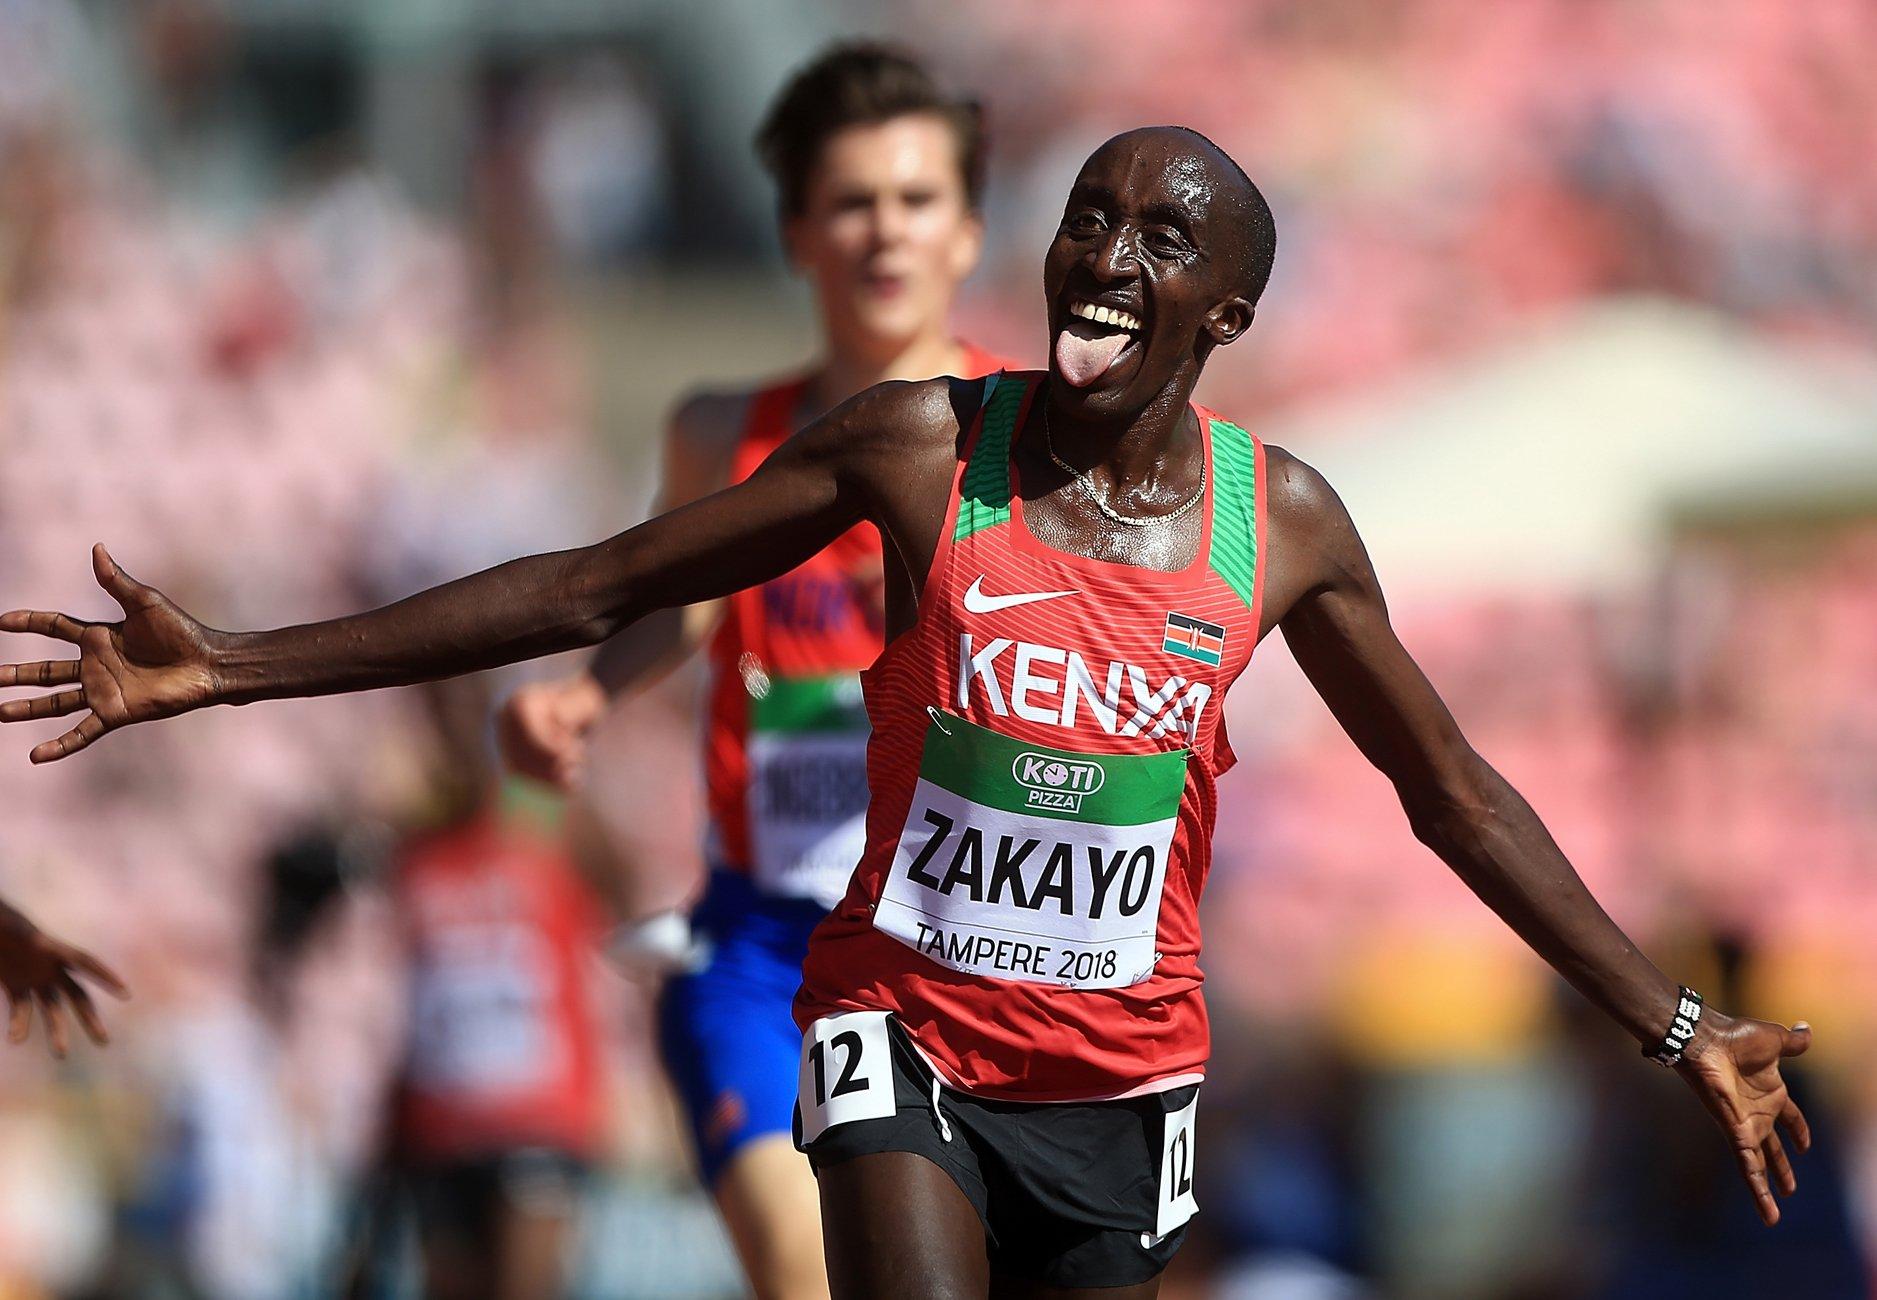 Edward Zakayo of Kenya celebrates winning the 5000m at the IAAF World U20 Championships Tampere 2018 / Photo Credit: Getty Images for IAAF